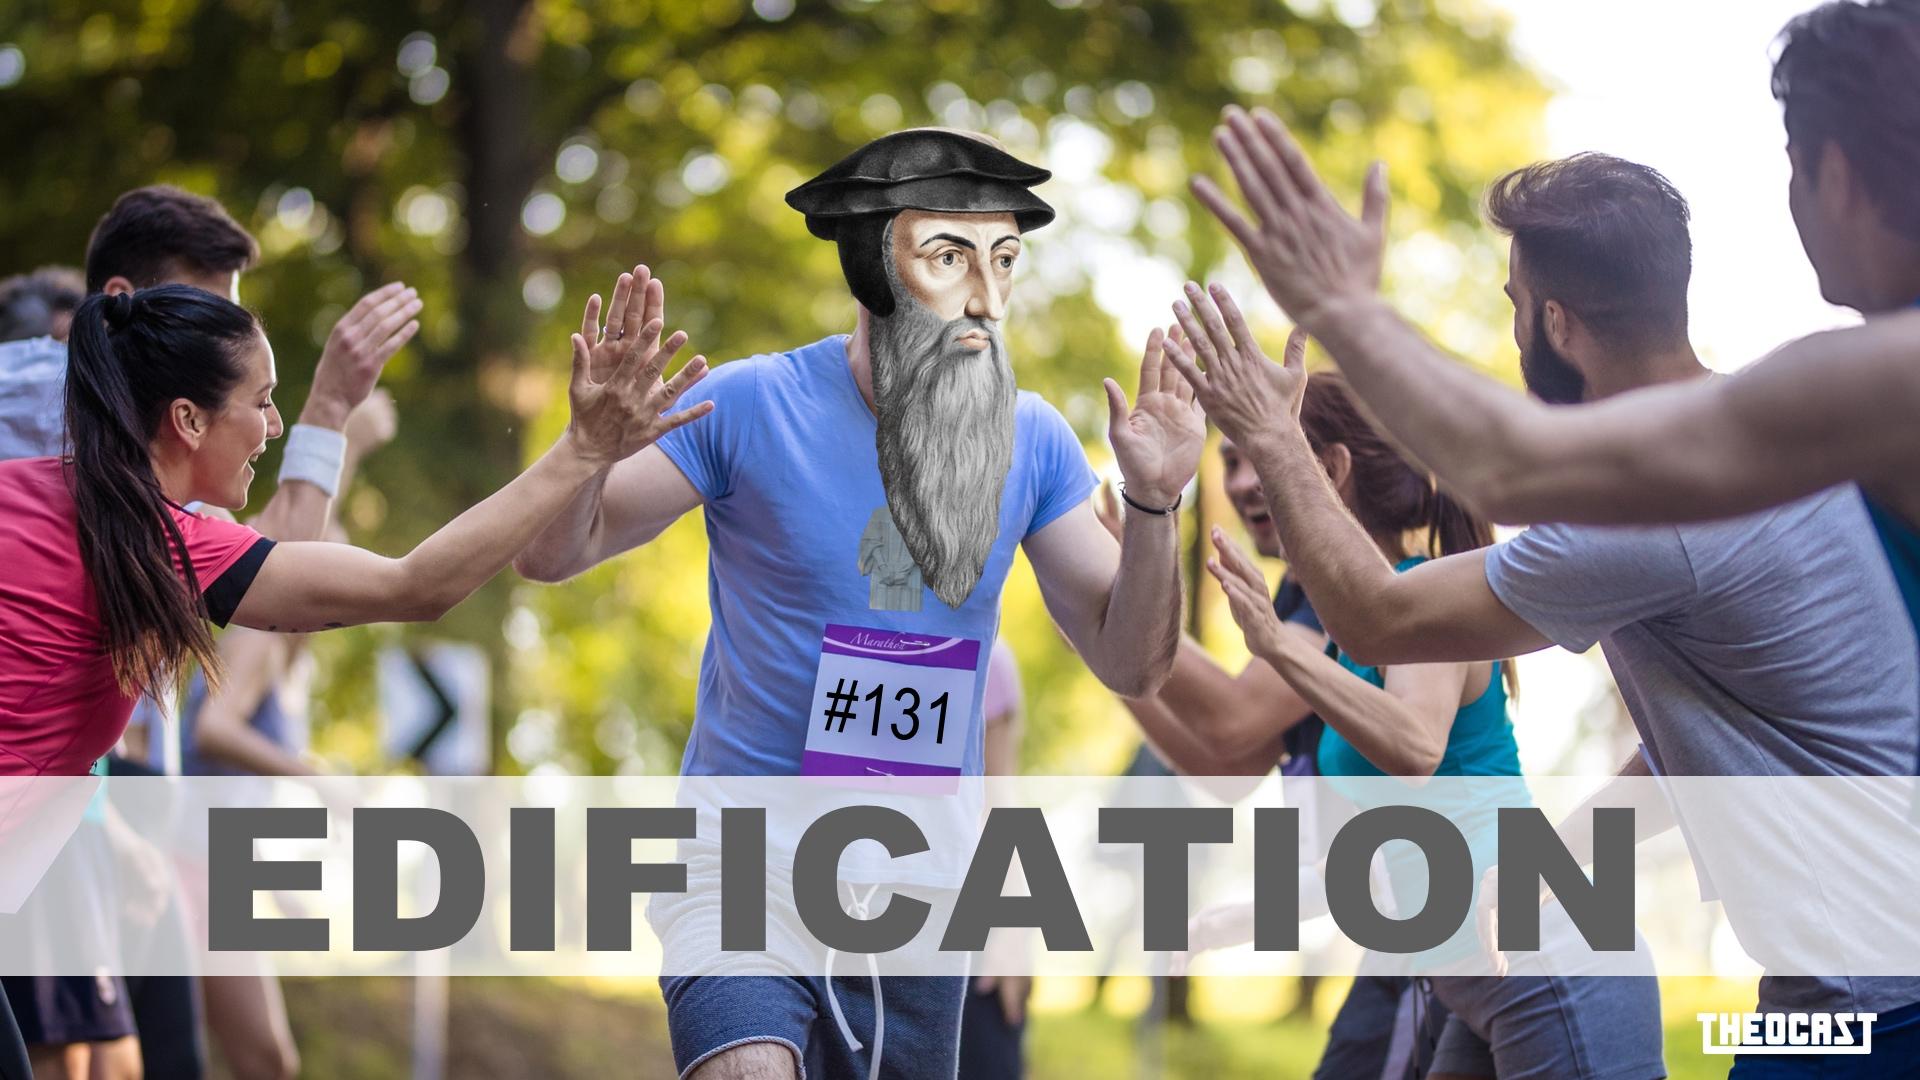 #131 Edification